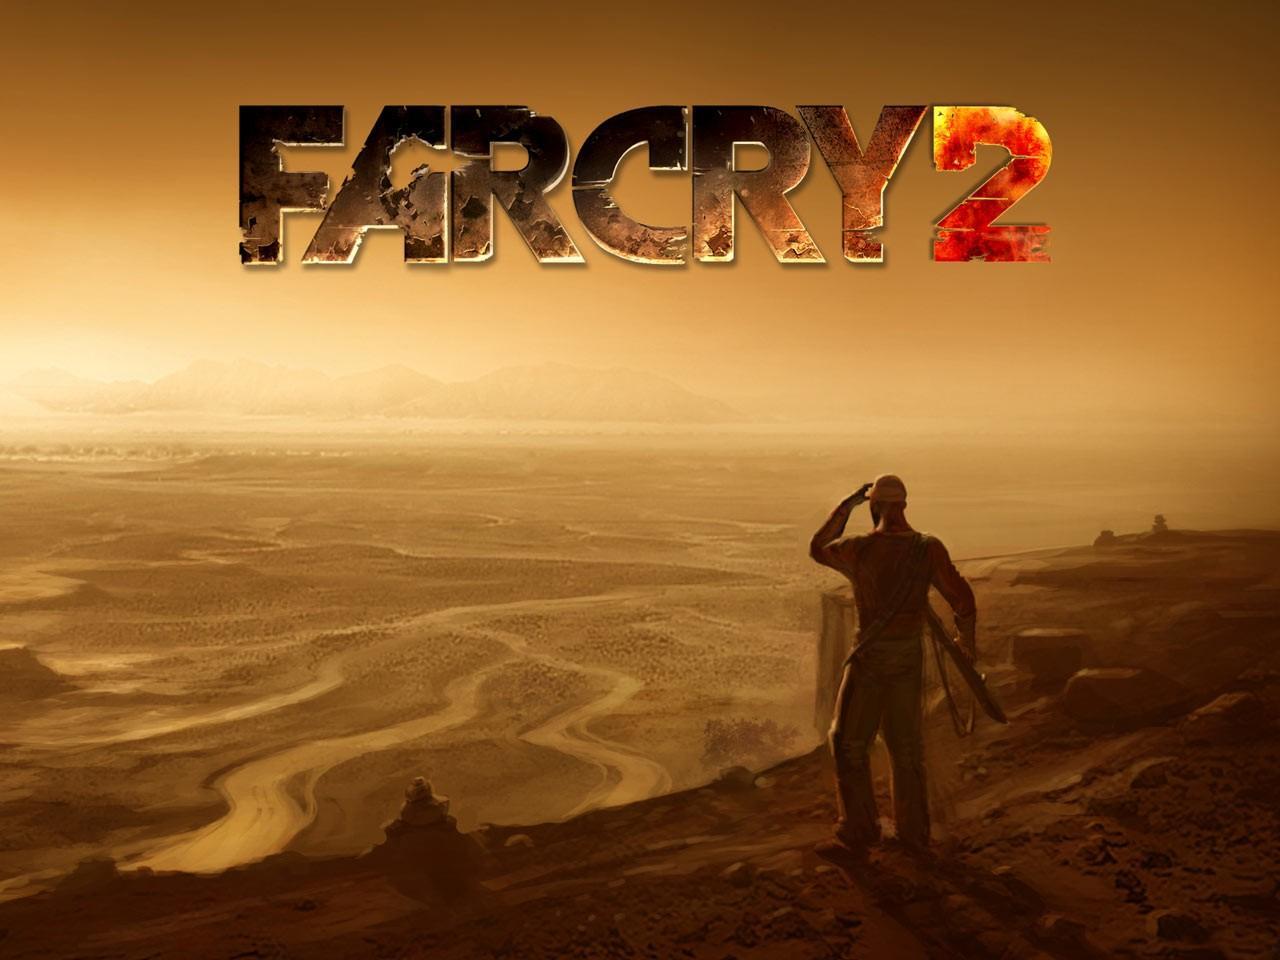 farcry 2((تکی2000تومان عمده1100تومان(هر5عدد) ))